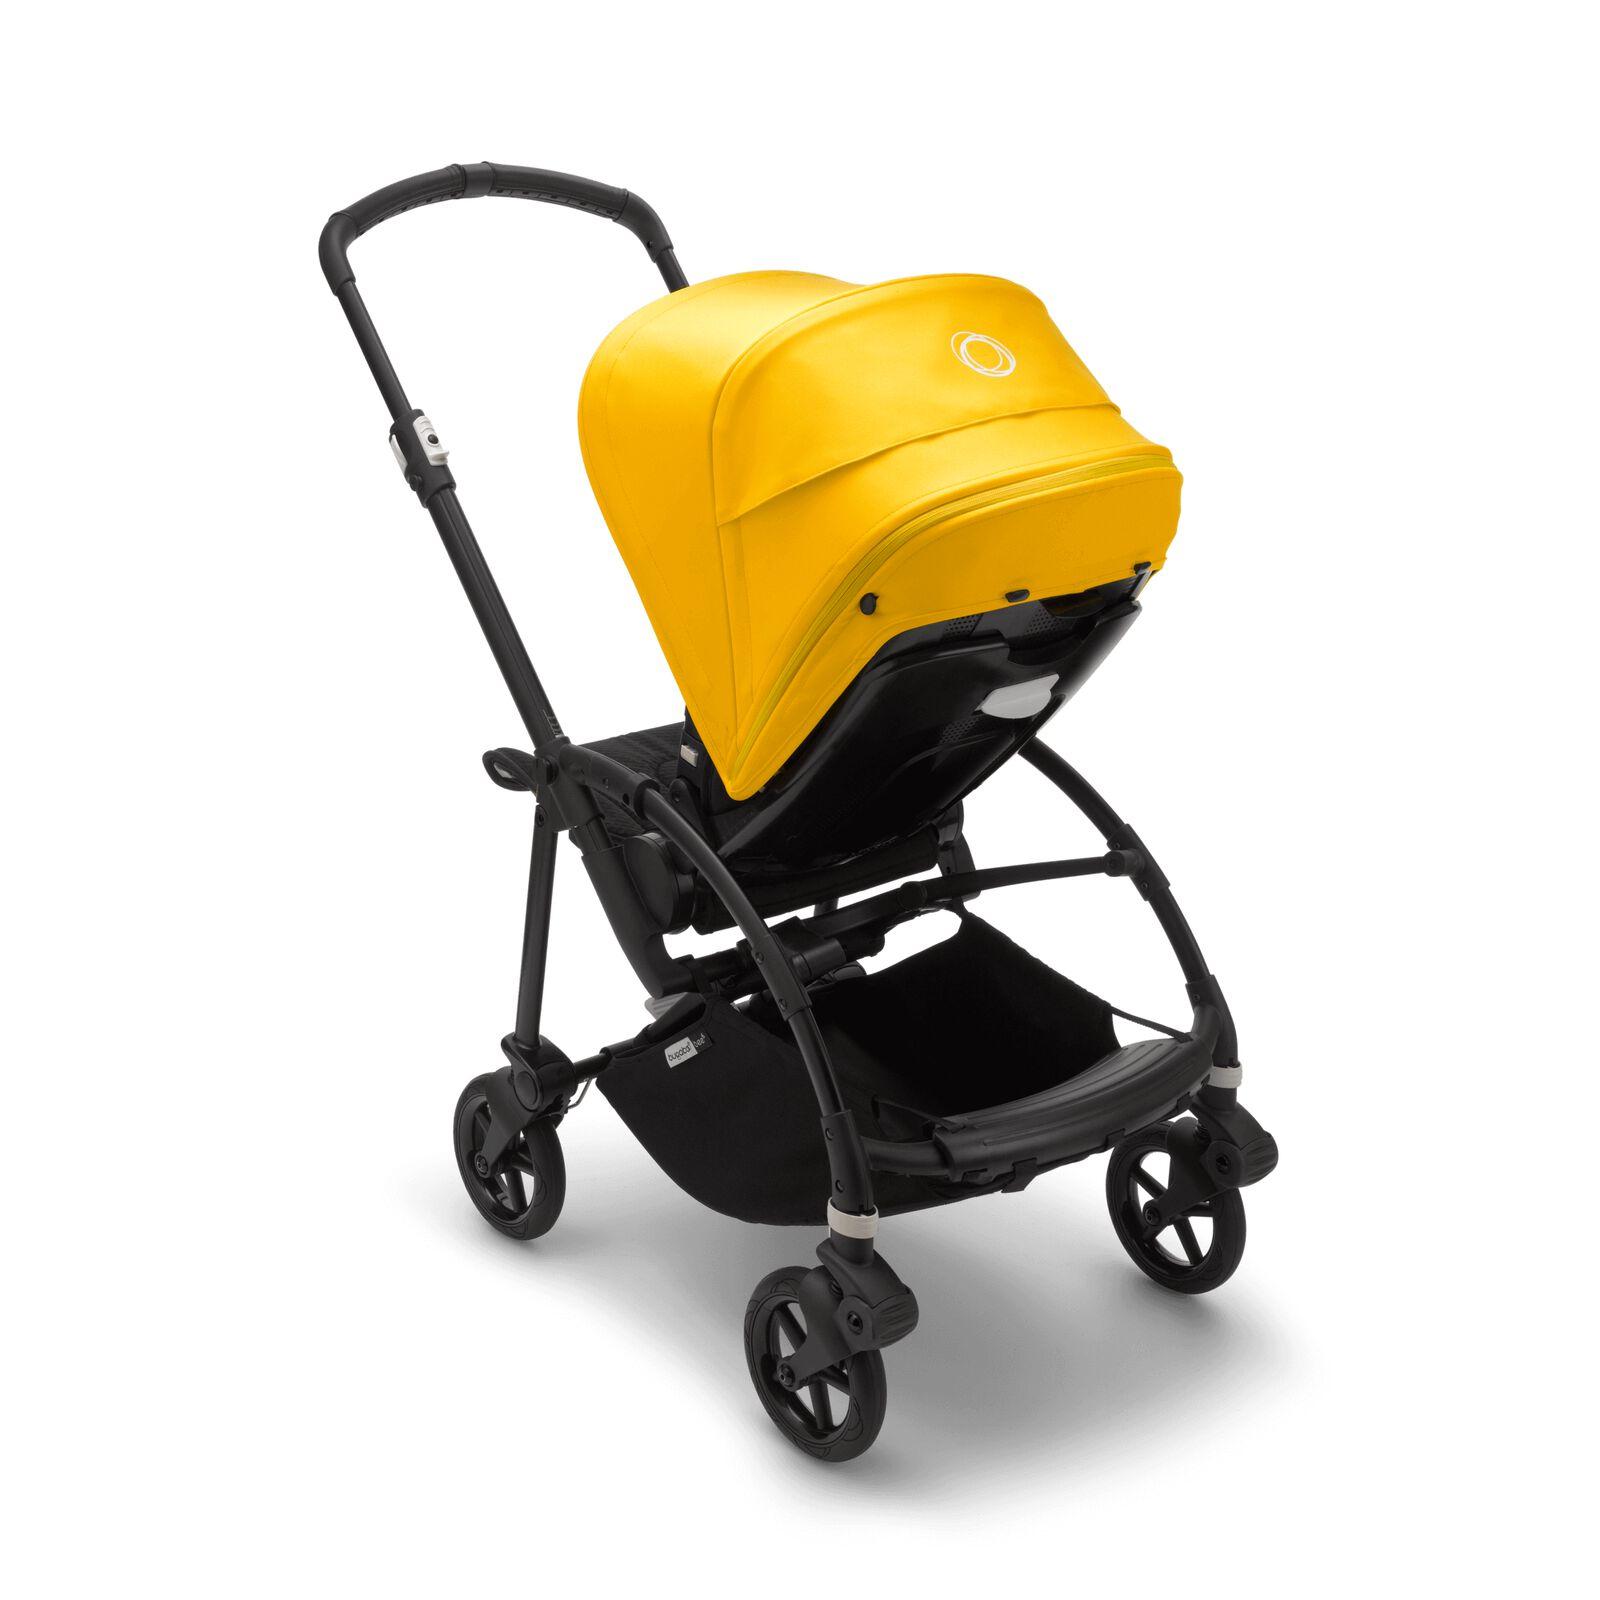 Bugaboo Bee 6 seat stroller